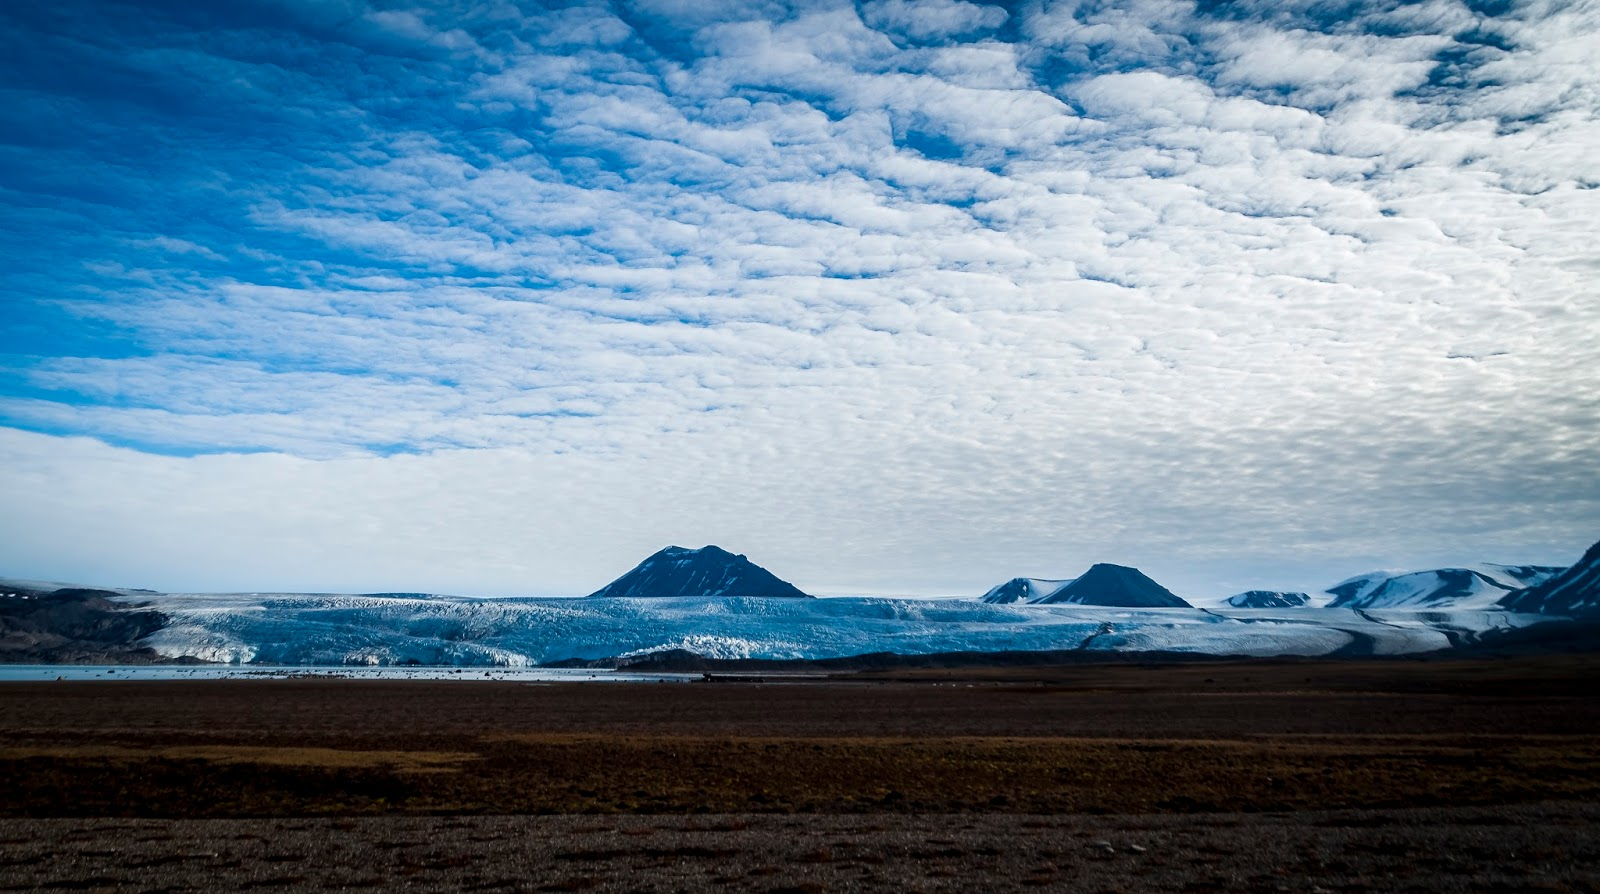 nordenskiold brucebyen svalbard spitzberg